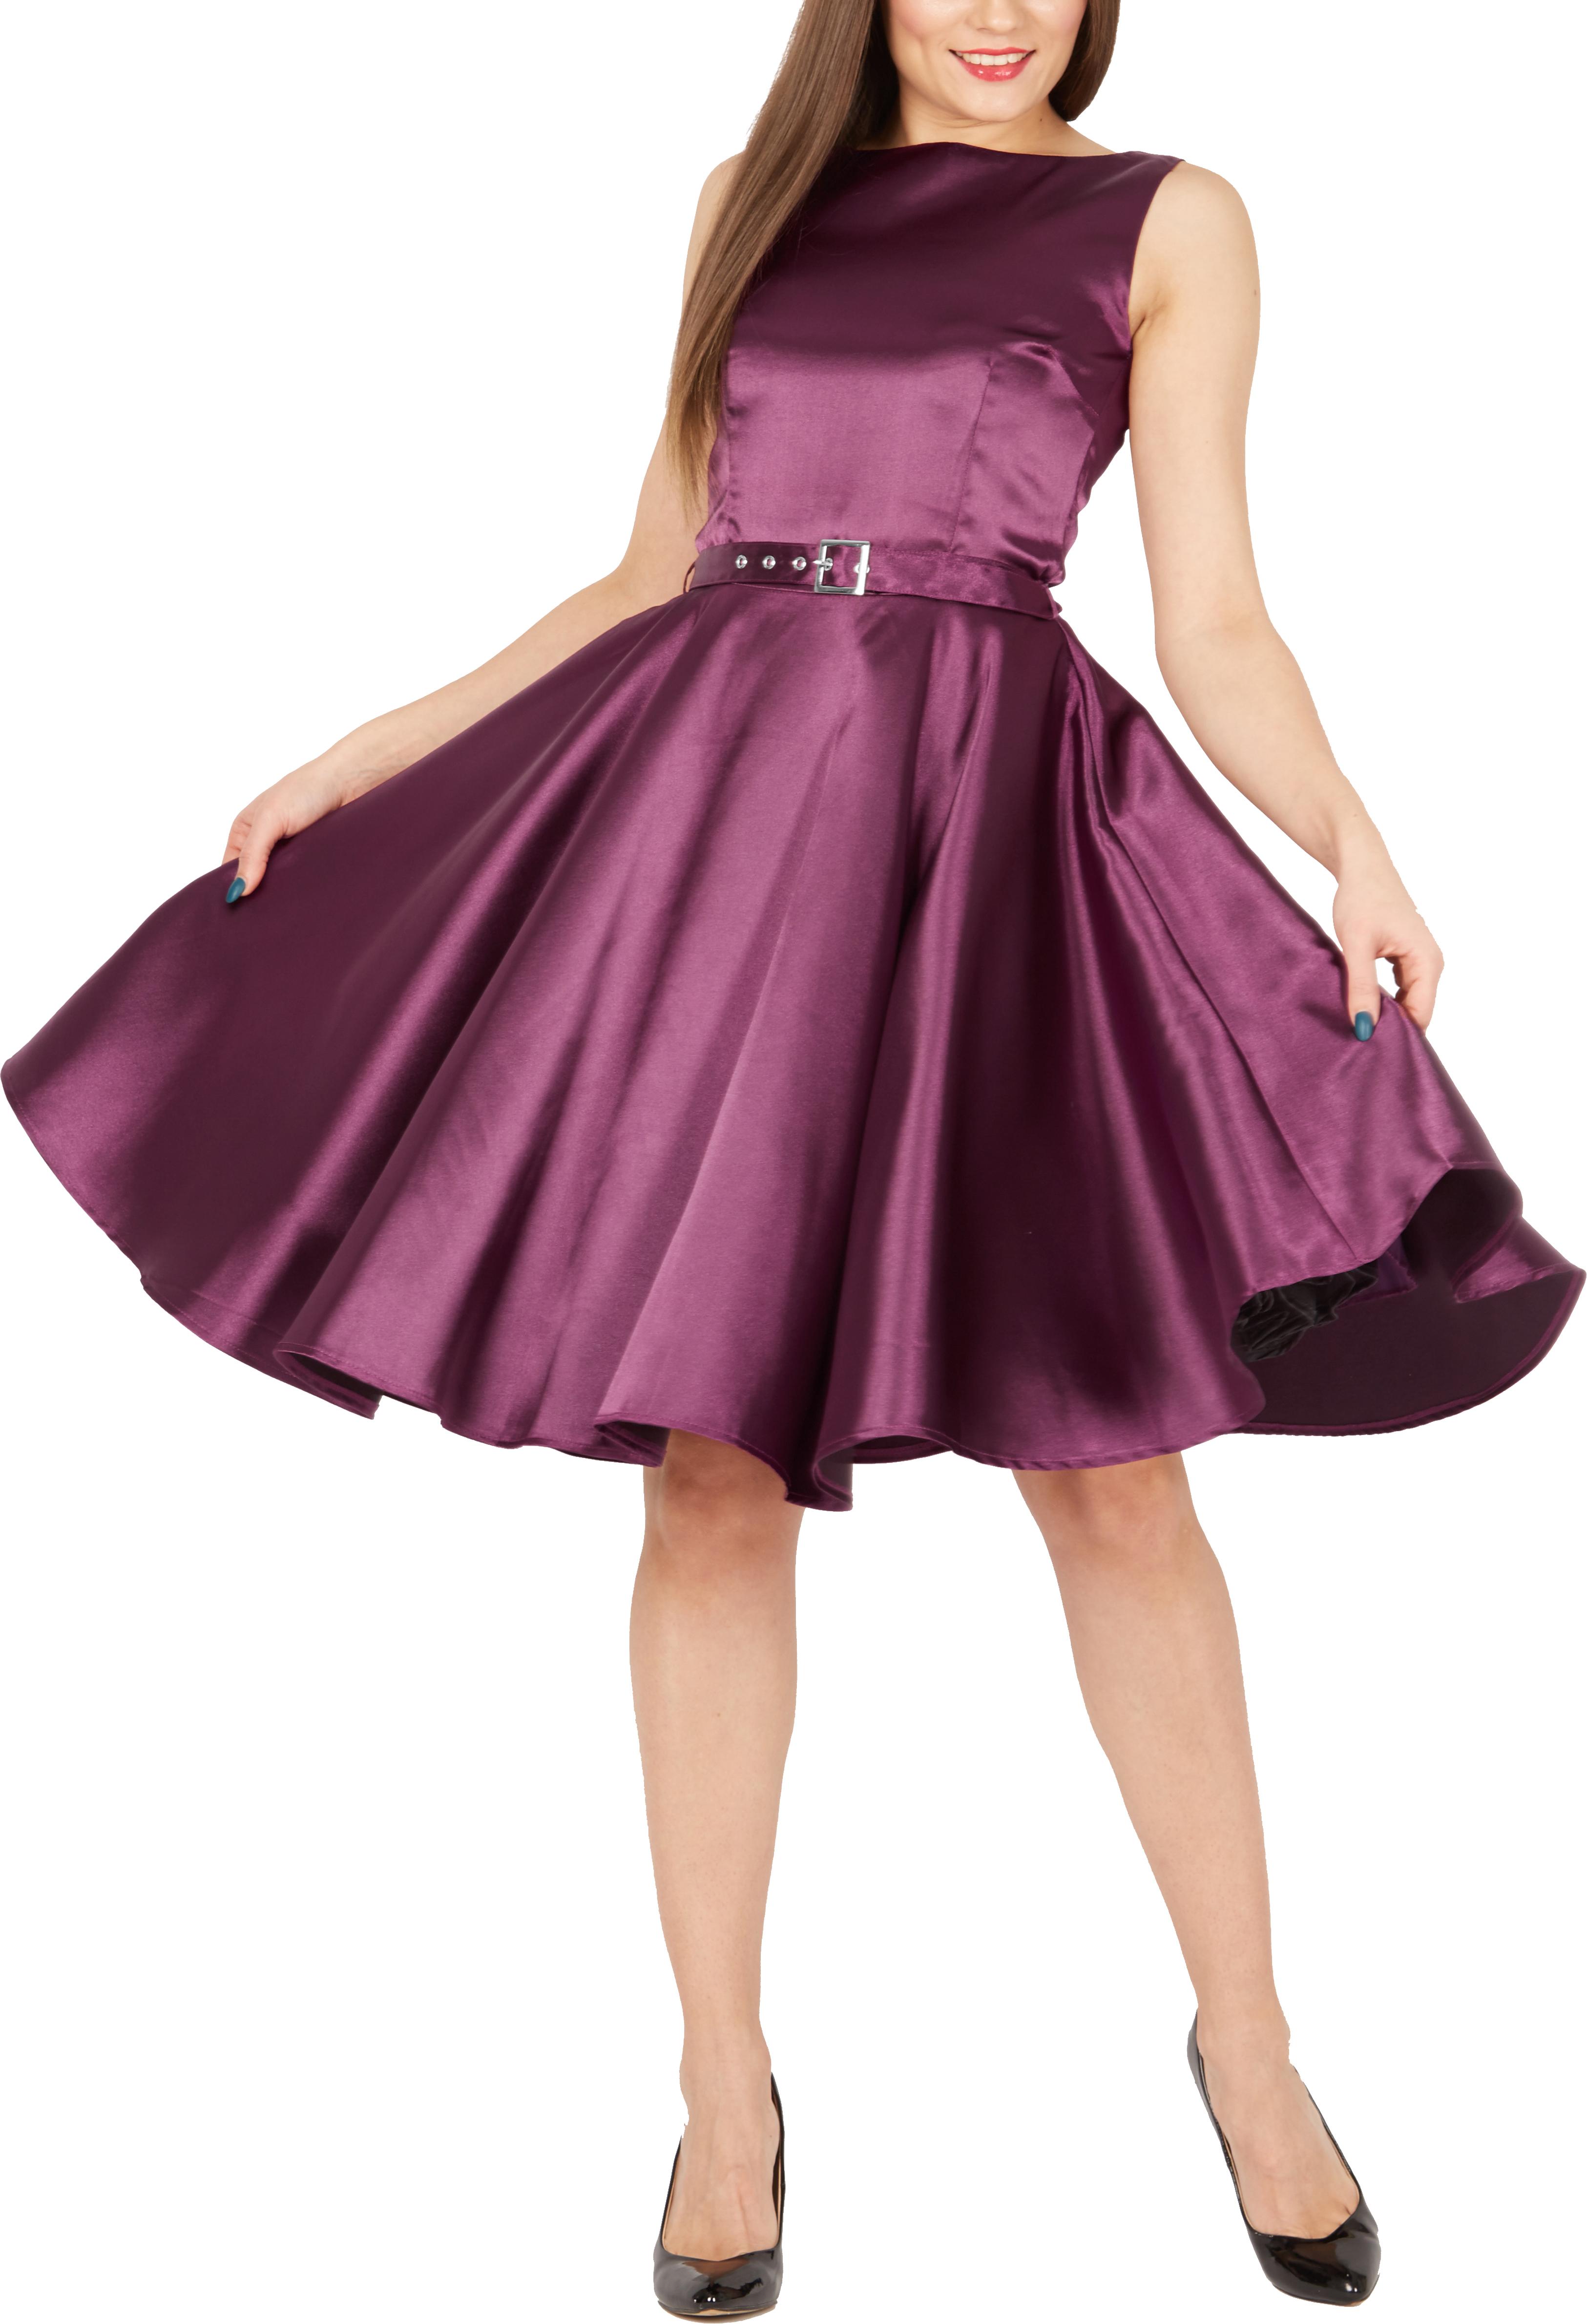 BlackButterfly-Audrey-Vintage-Satin-Clarity-Vintage-50-039-s-Rockabilly-Swing-Dress thumbnail 13